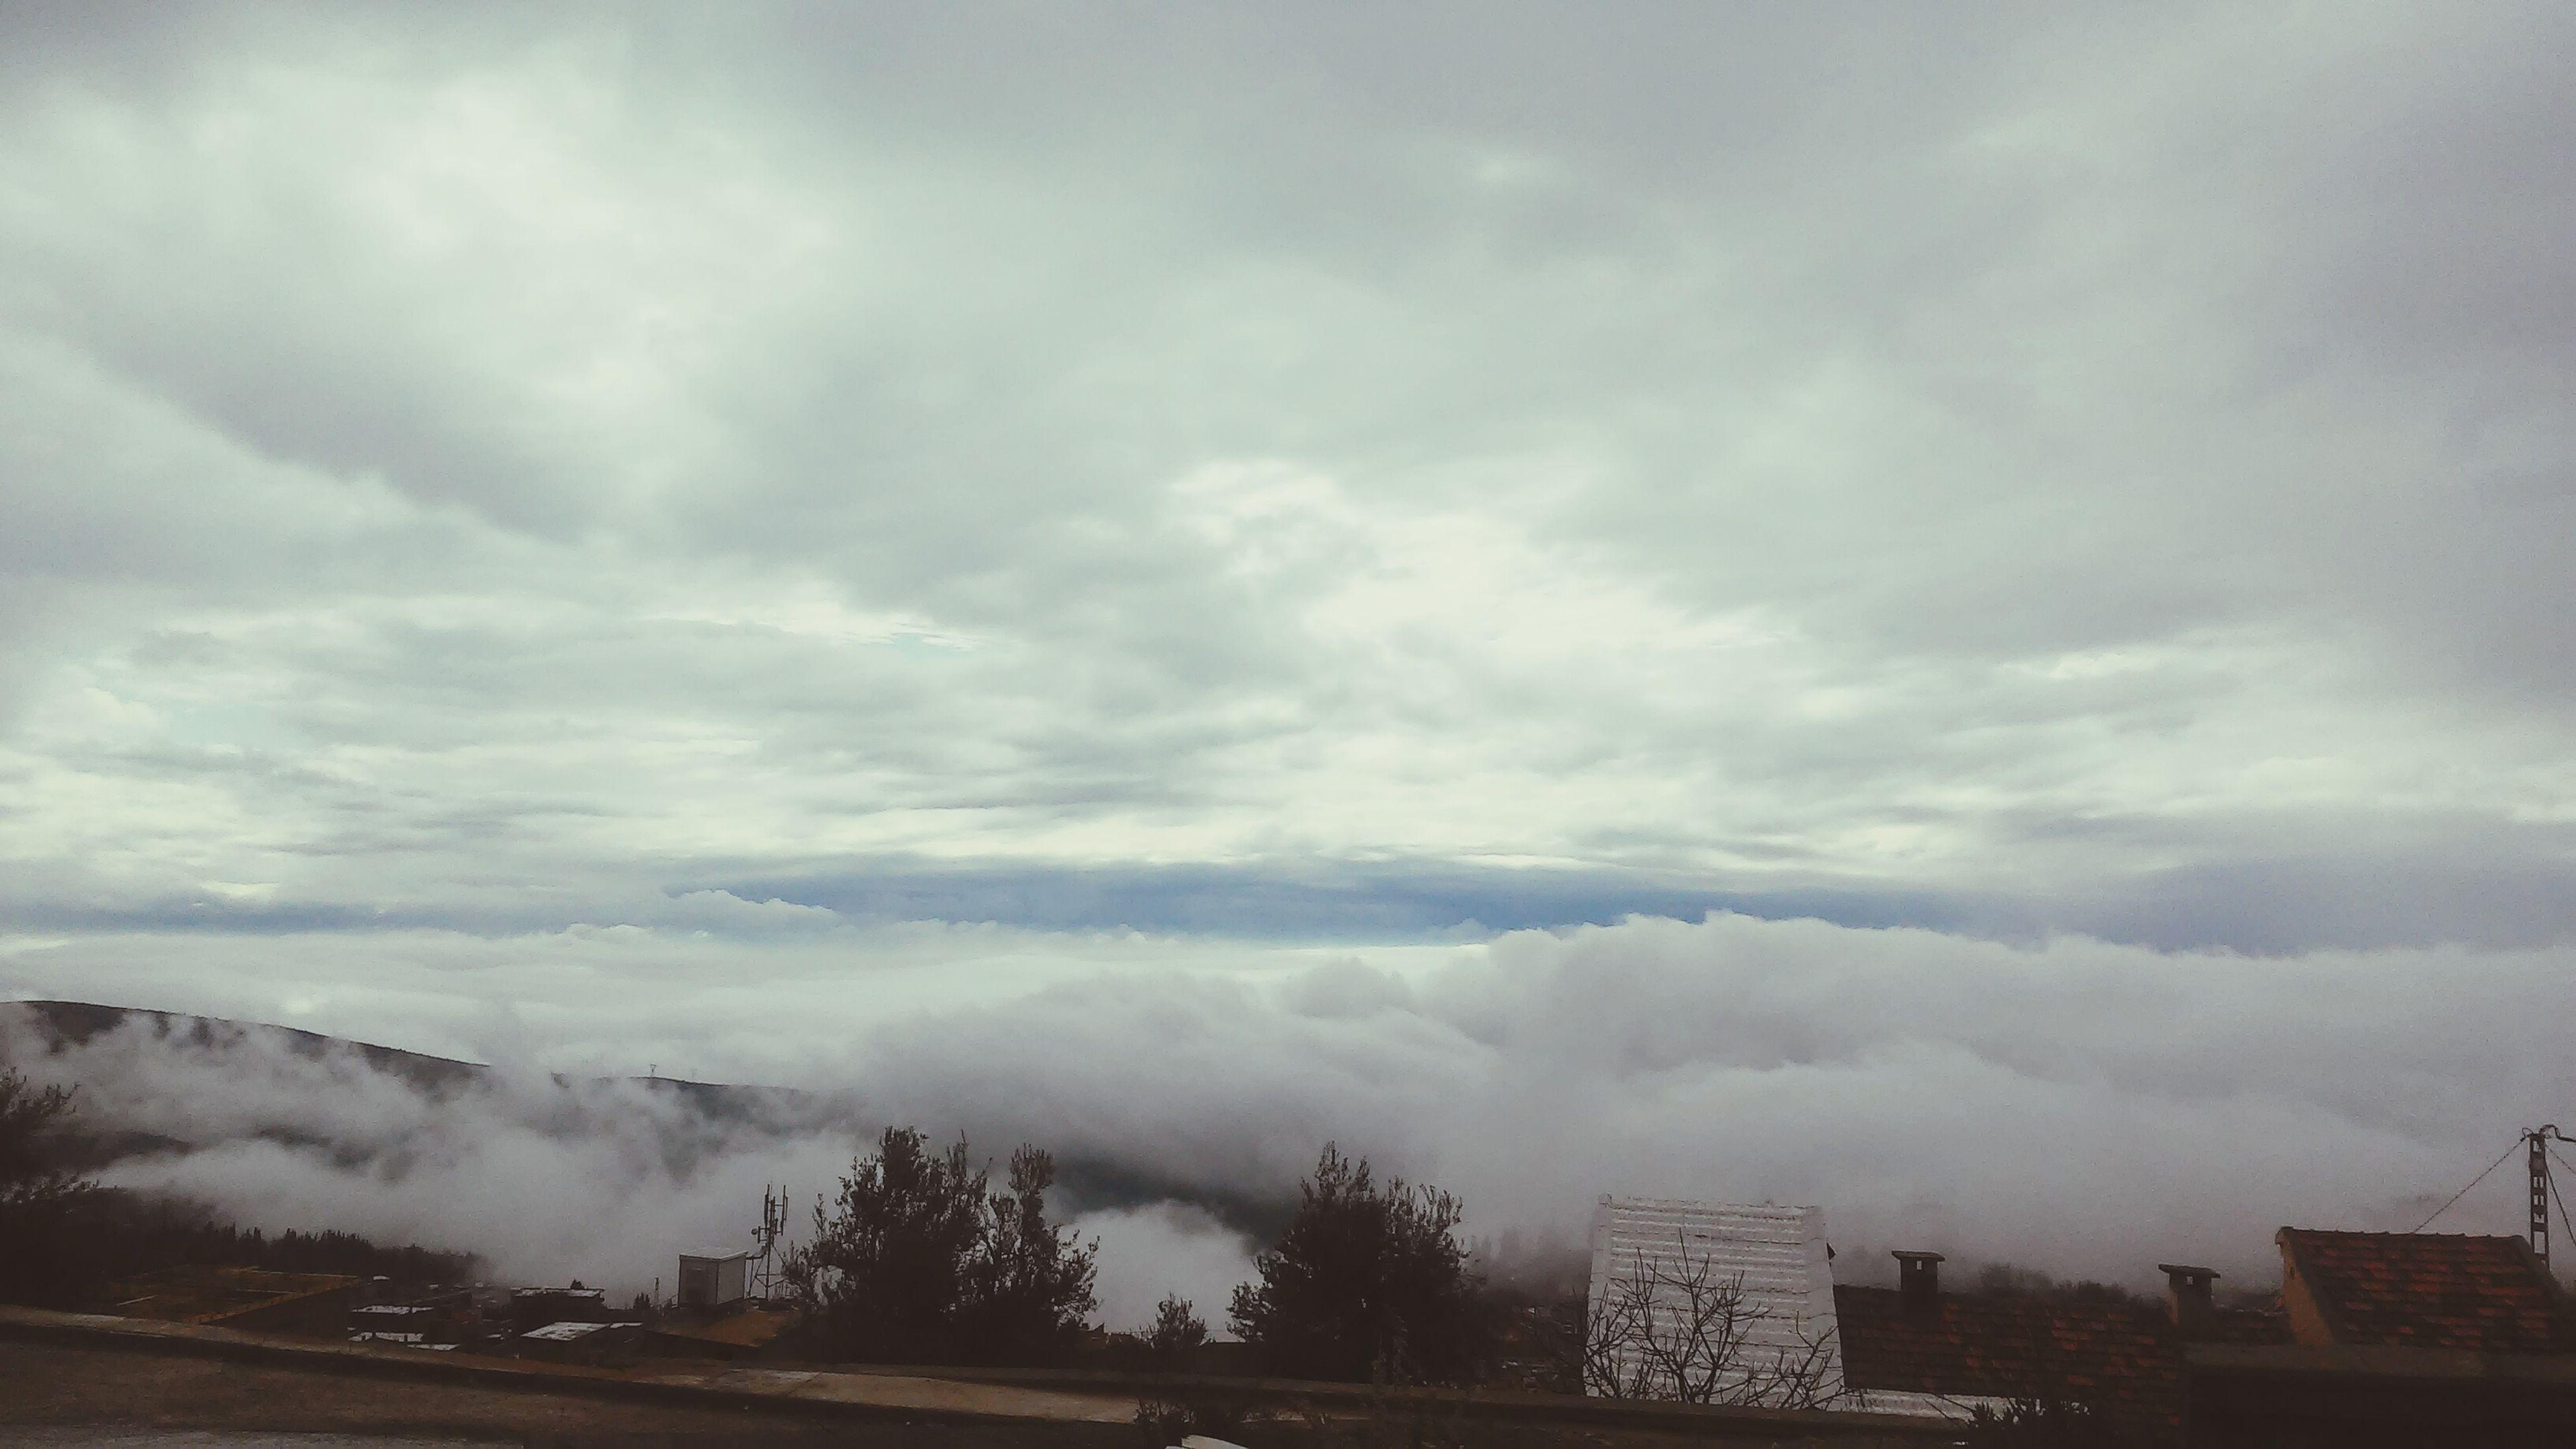 sky, cloud - sky, weather, cloudy, mountain, building exterior, overcast, scenics, beauty in nature, fog, nature, built structure, architecture, landscape, cloud, tranquility, day, tranquil scene, city, mountain range